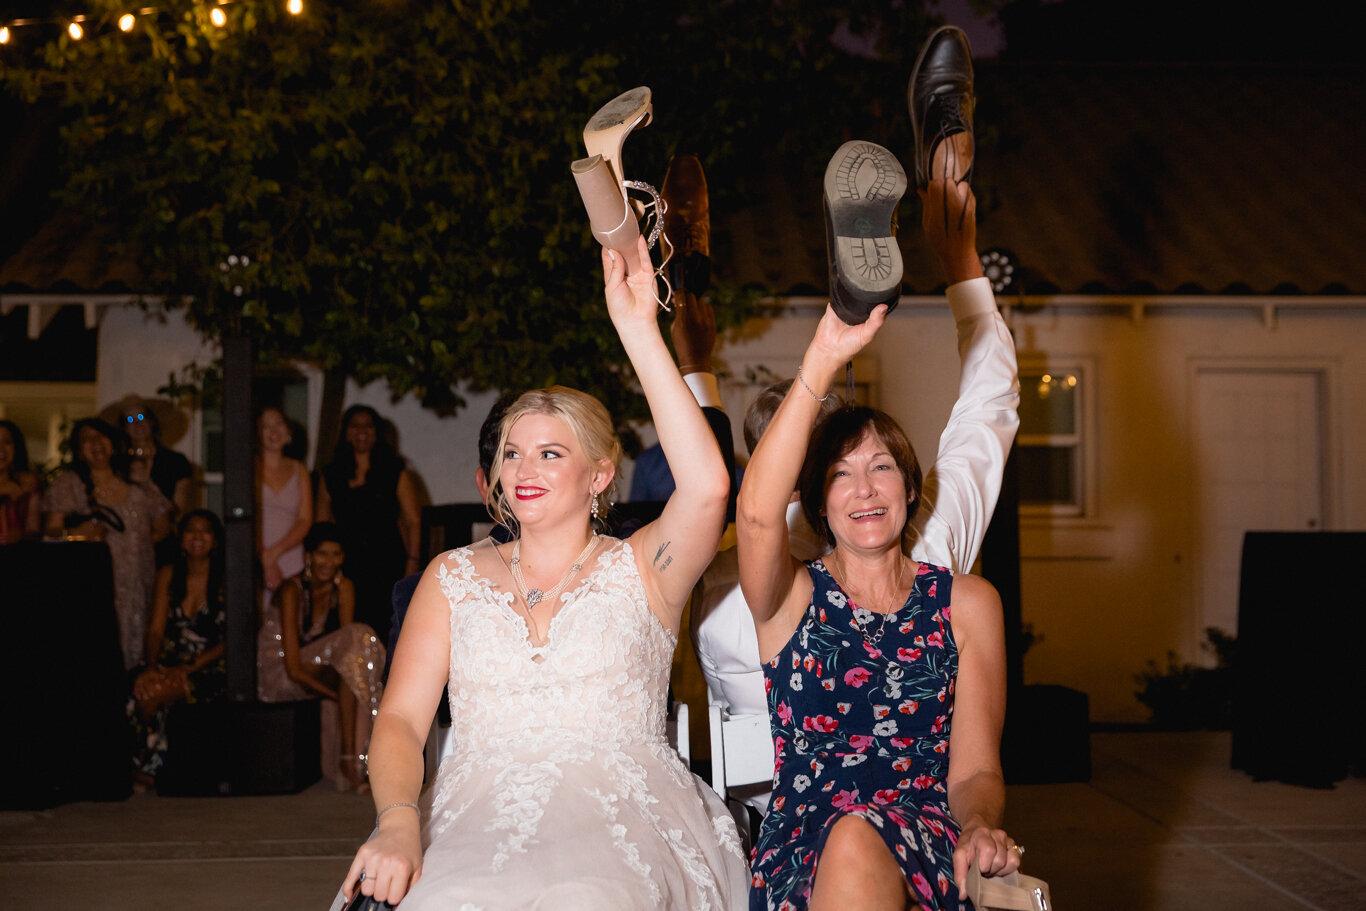 2019.08.24_Emily-Ashir-Wedding-at-the-Maples-6452.jpg